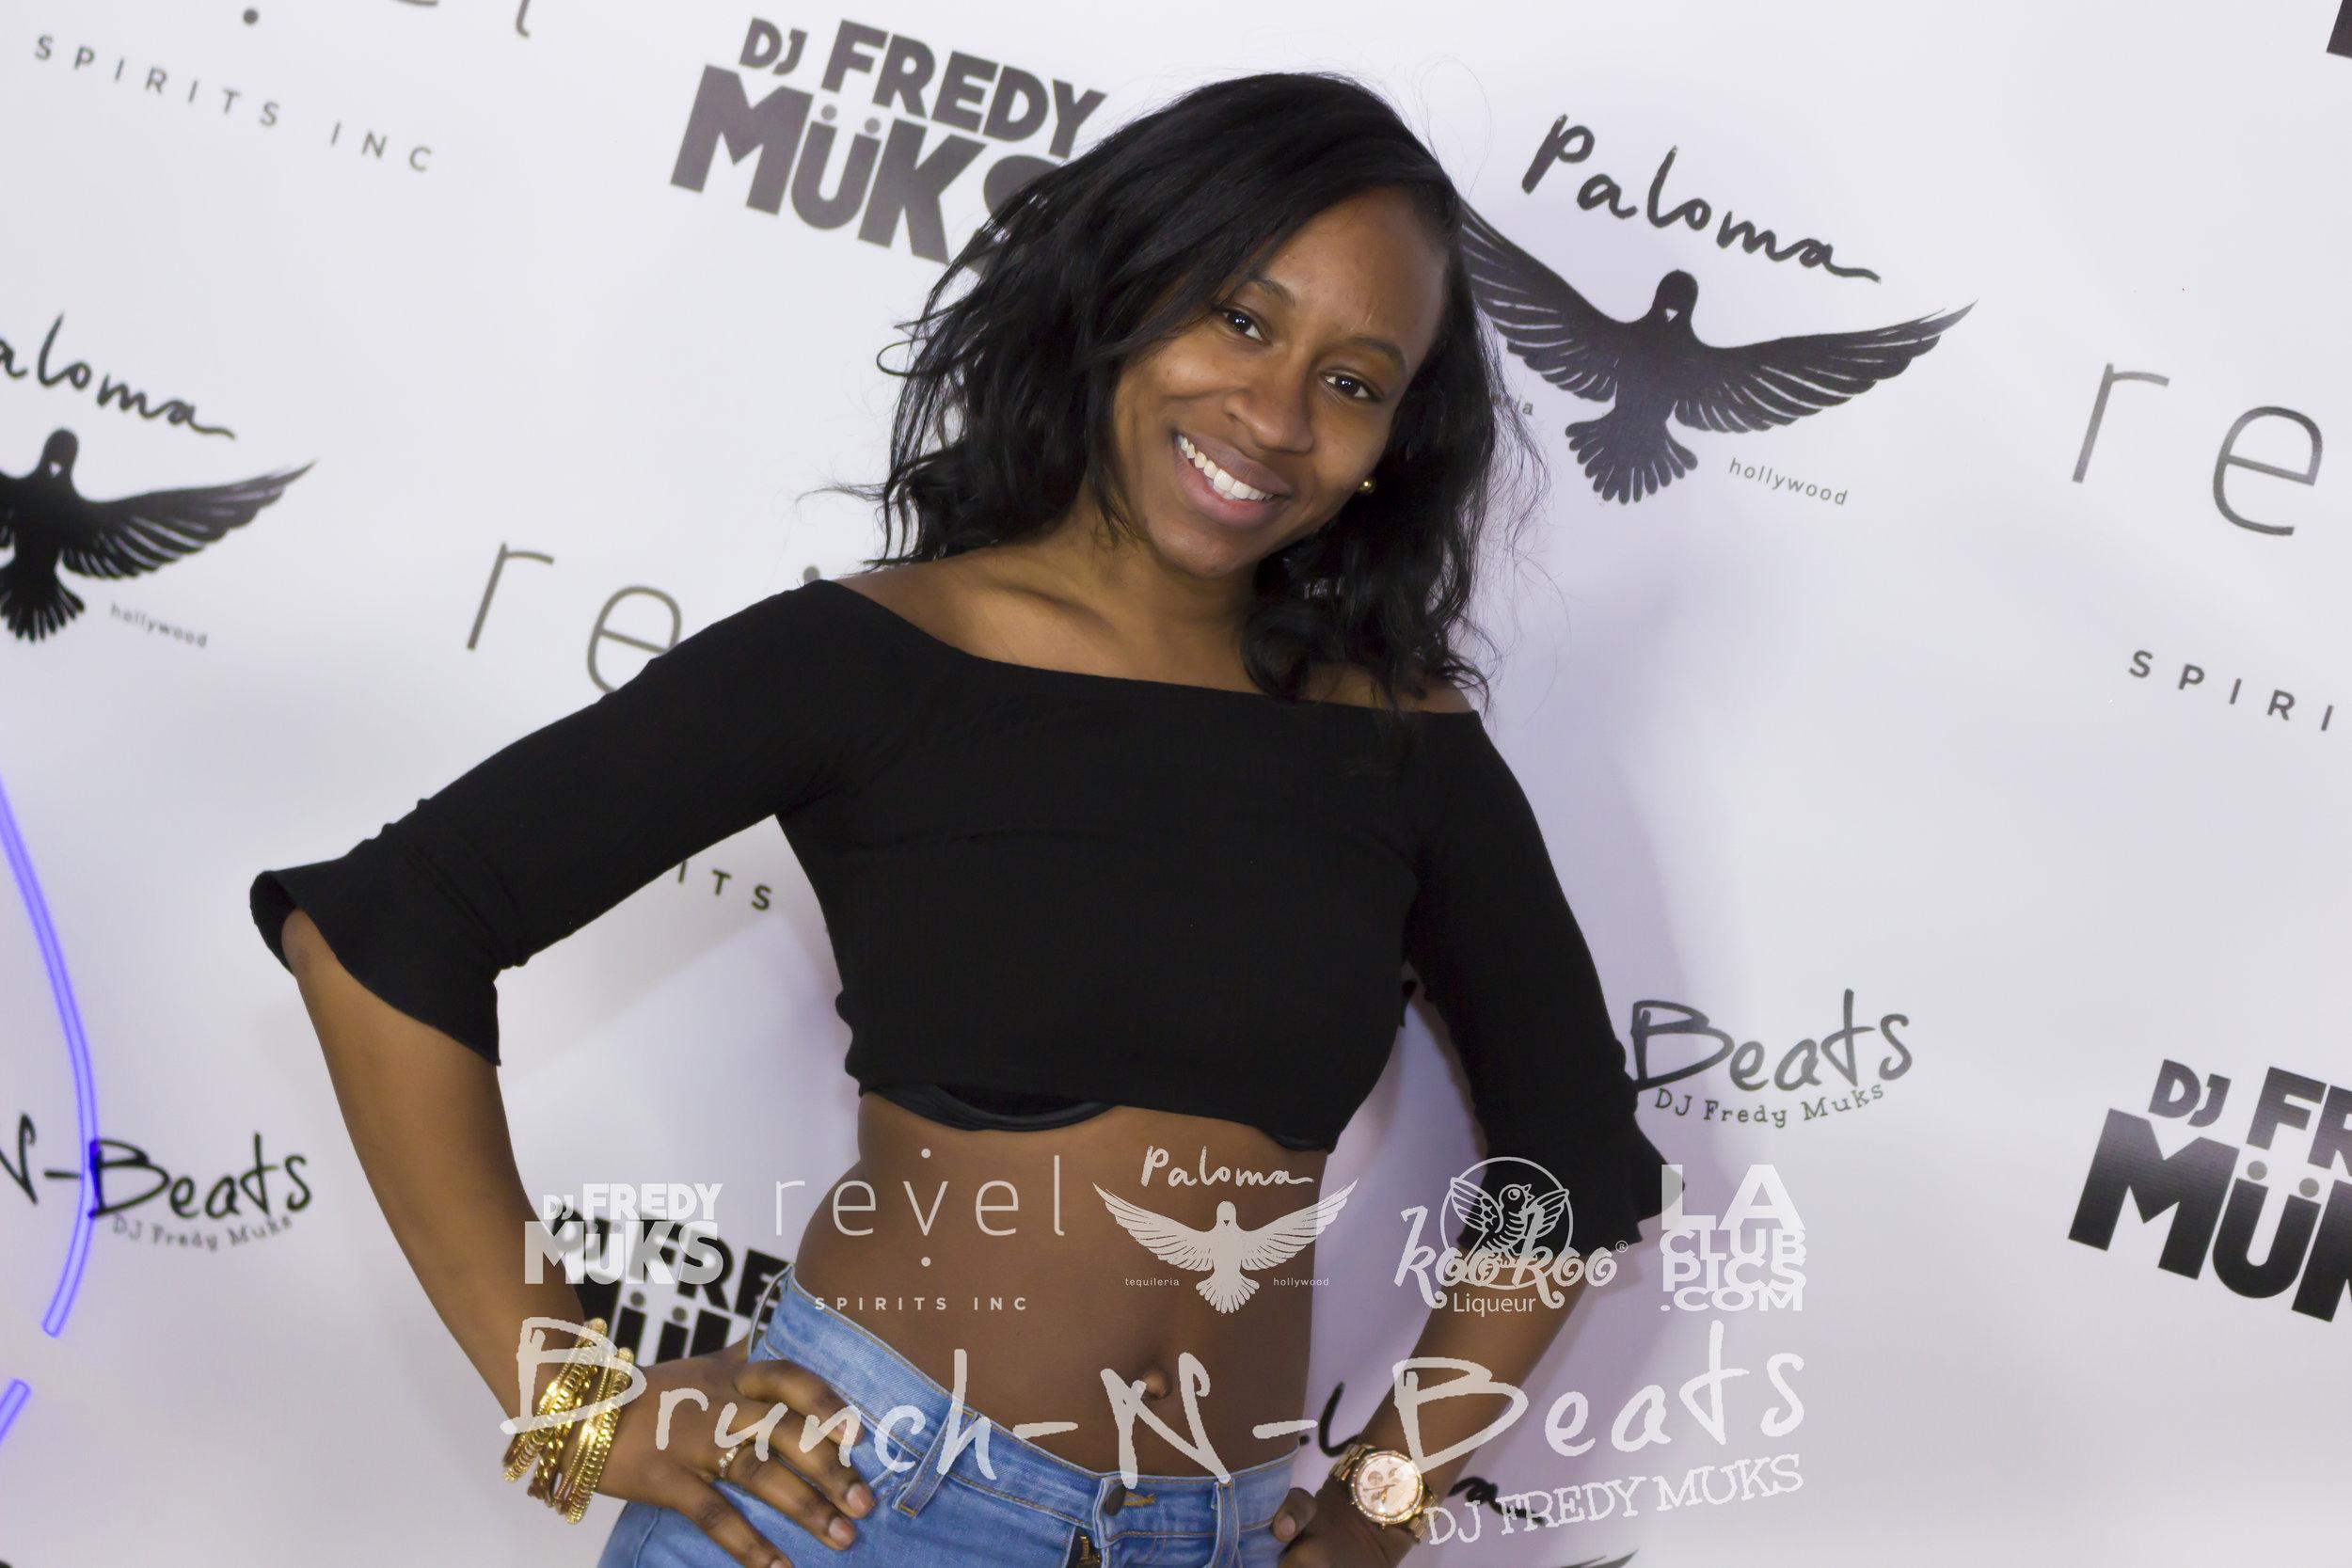 Brunch-N-Beats - Paloma Hollywood - 02-25-18_203.jpg